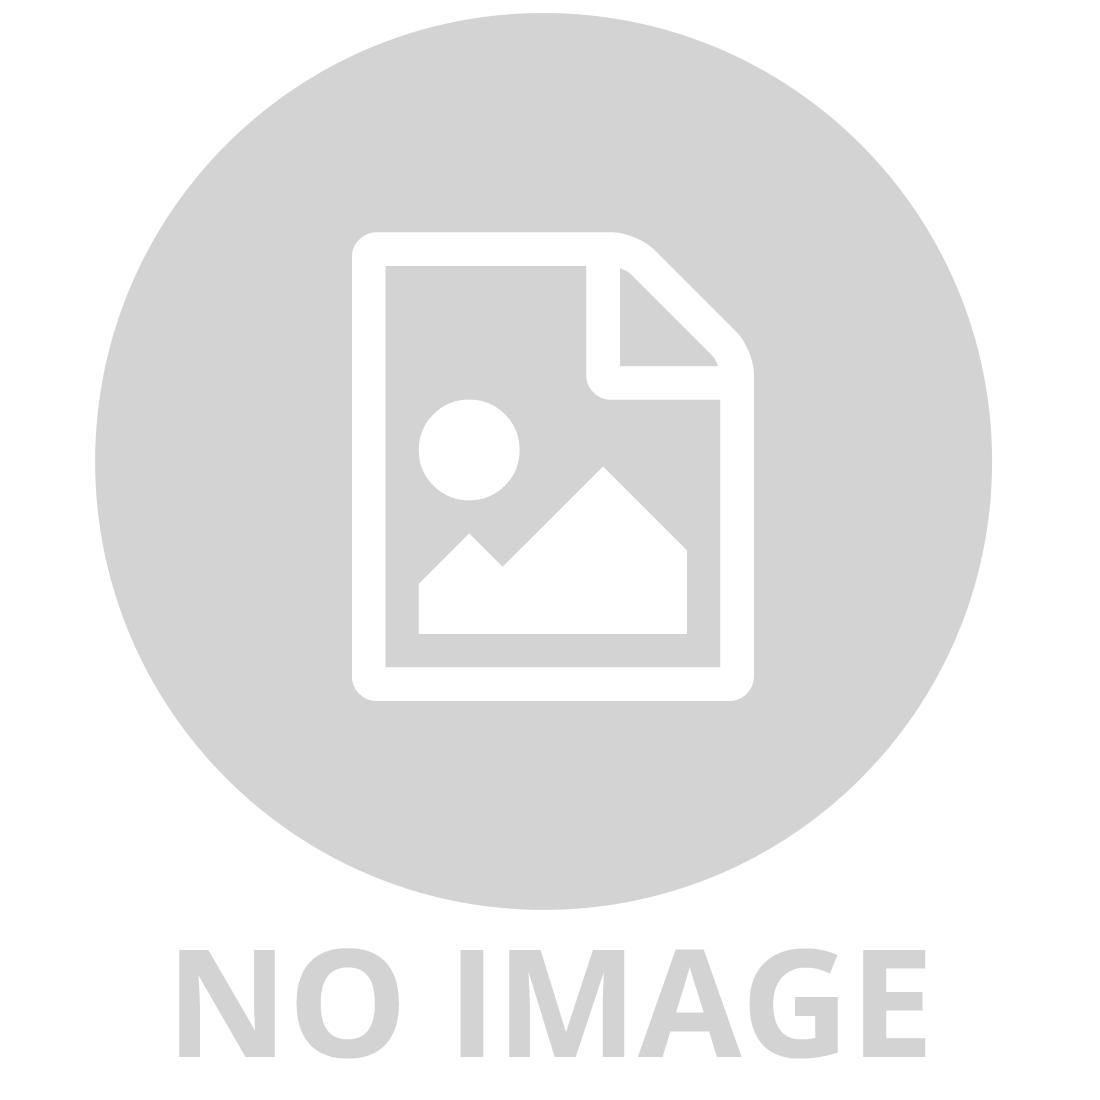 LEGO JURASSIC WORLD 10758 T-REX BREAKOUT